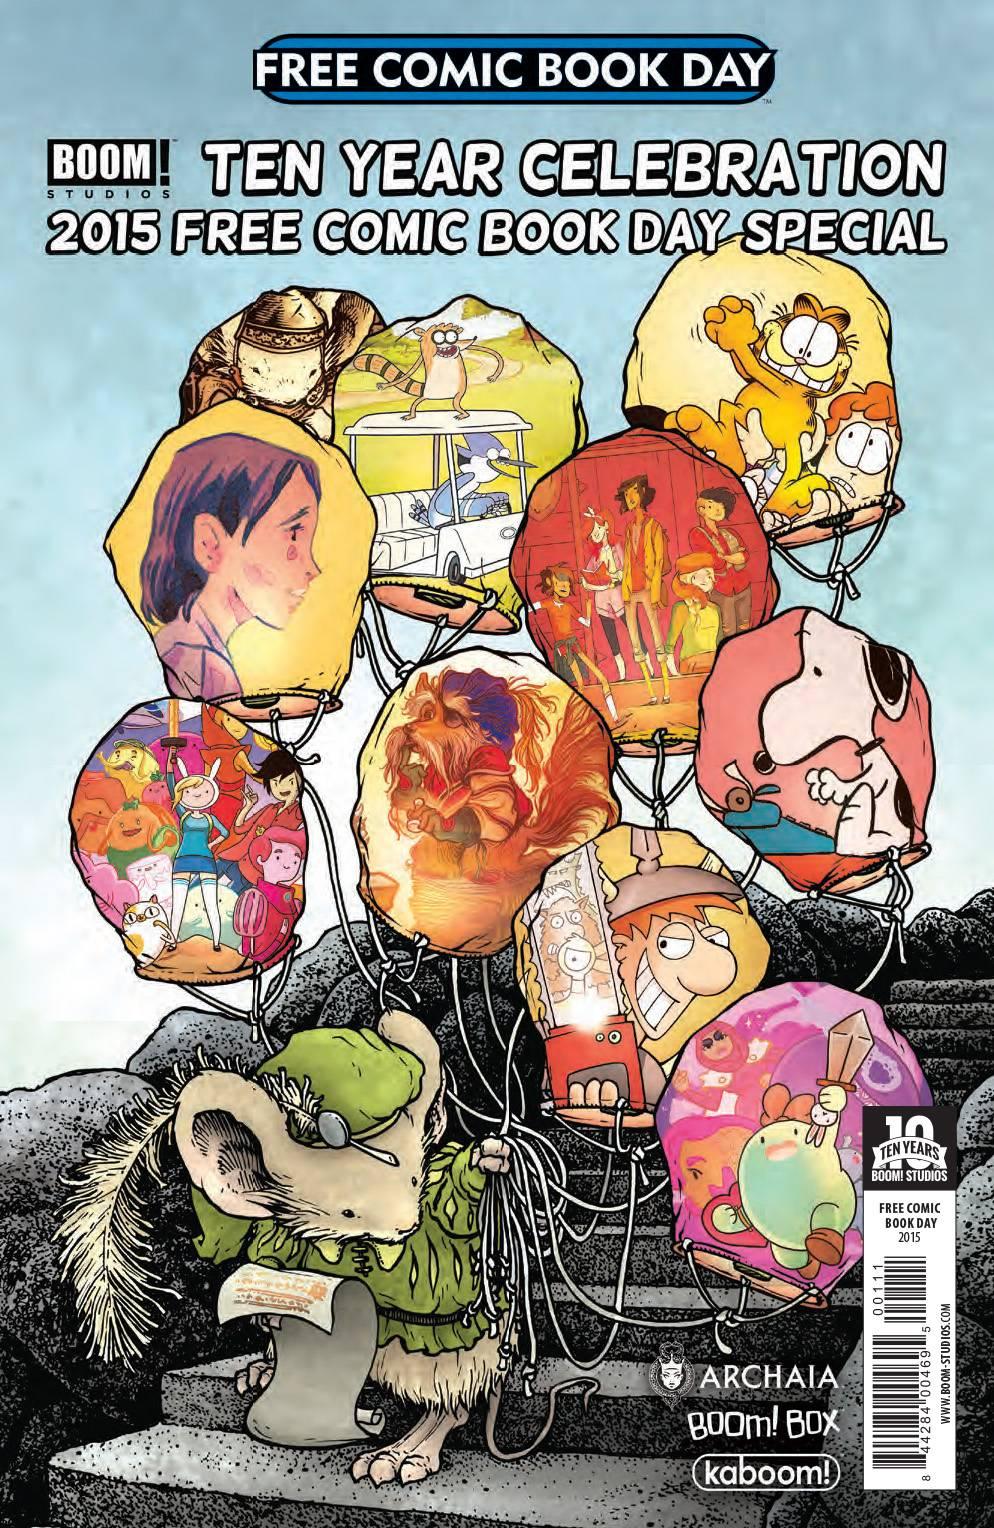 Free Comic Book Day 2015: Boom Studios 10th Anniversary Special #1